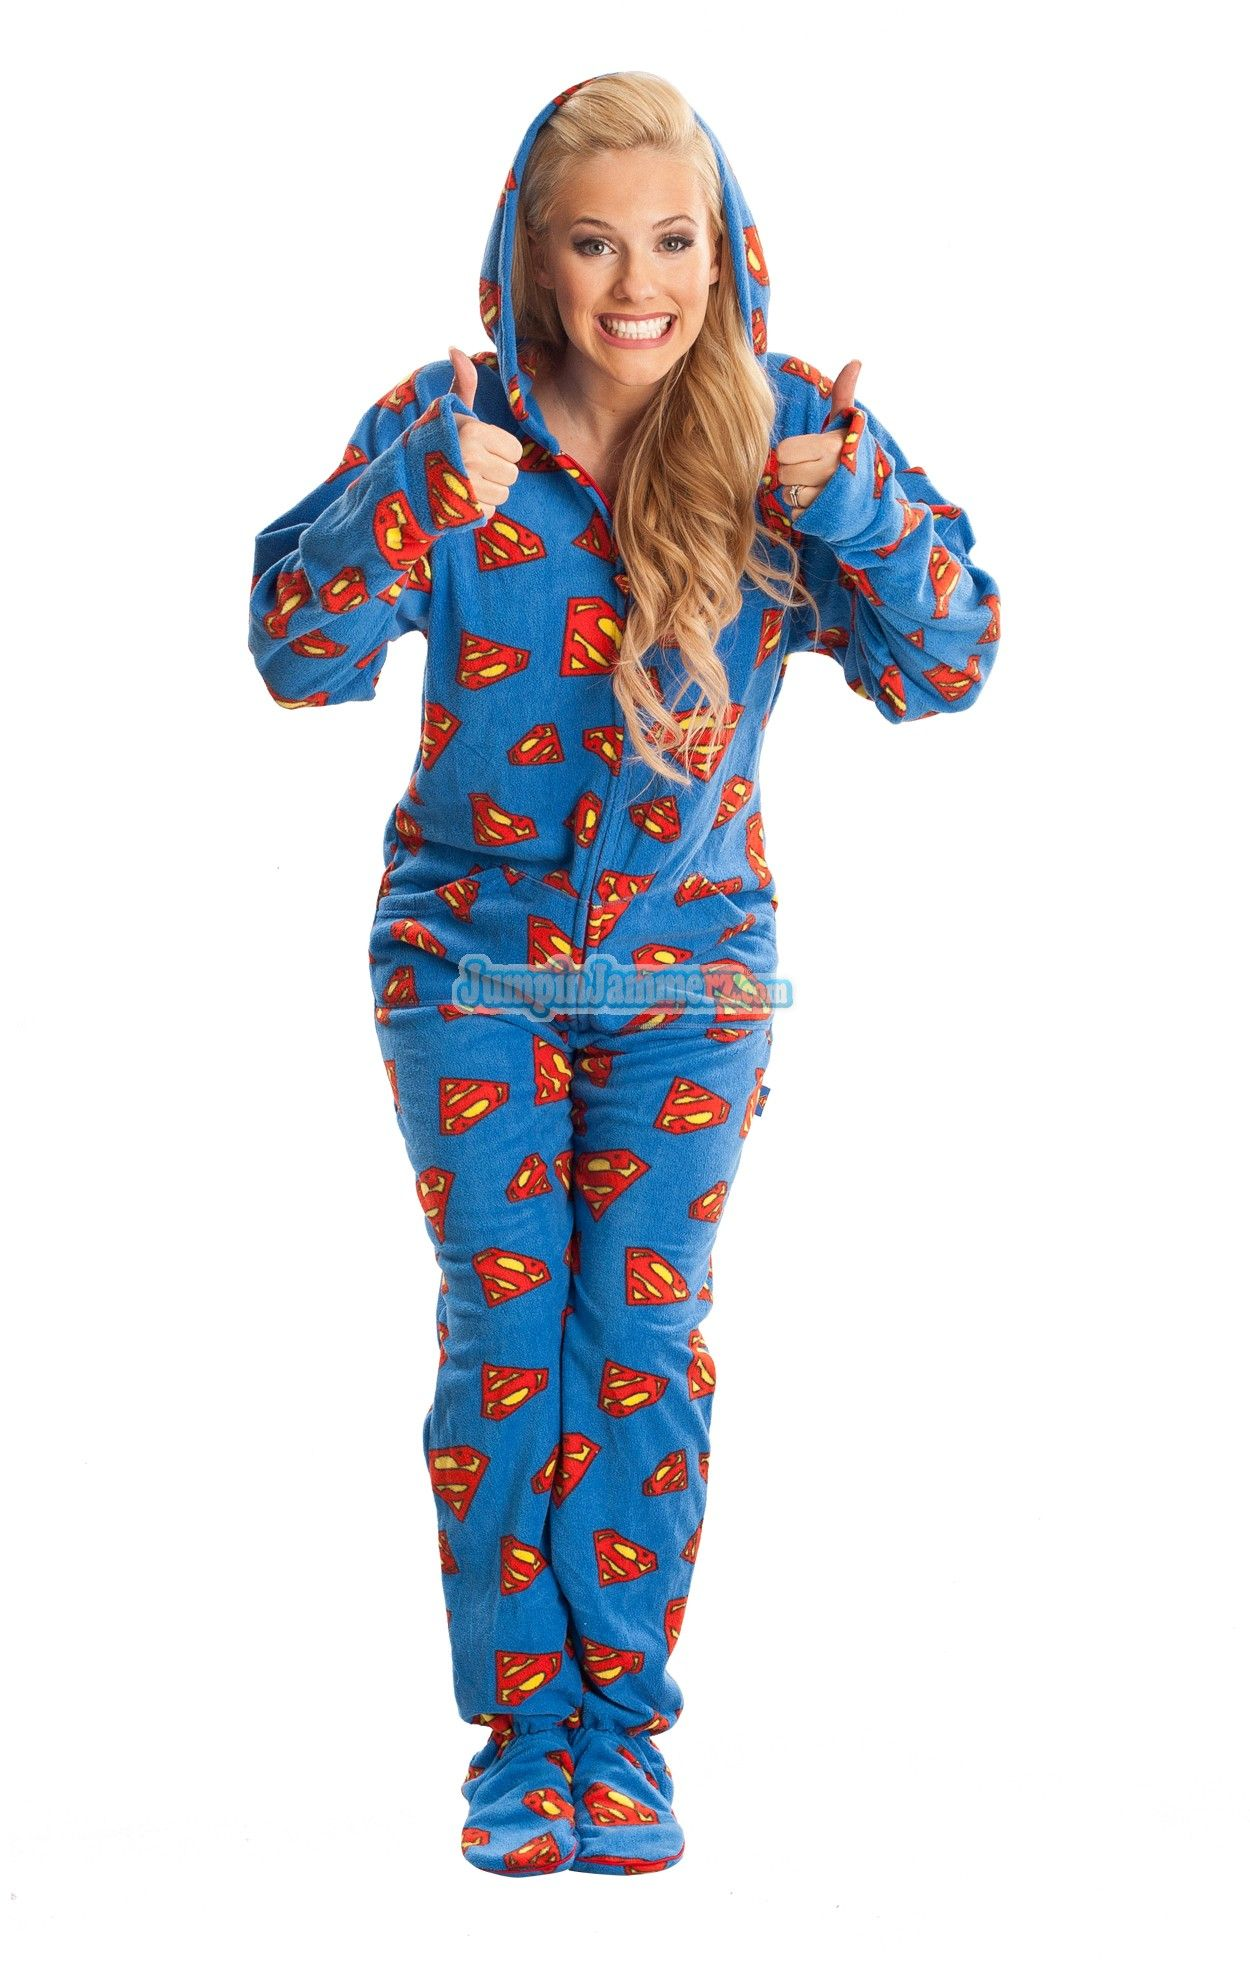 ebce40338320 Buy Superman Pajamas for Adults